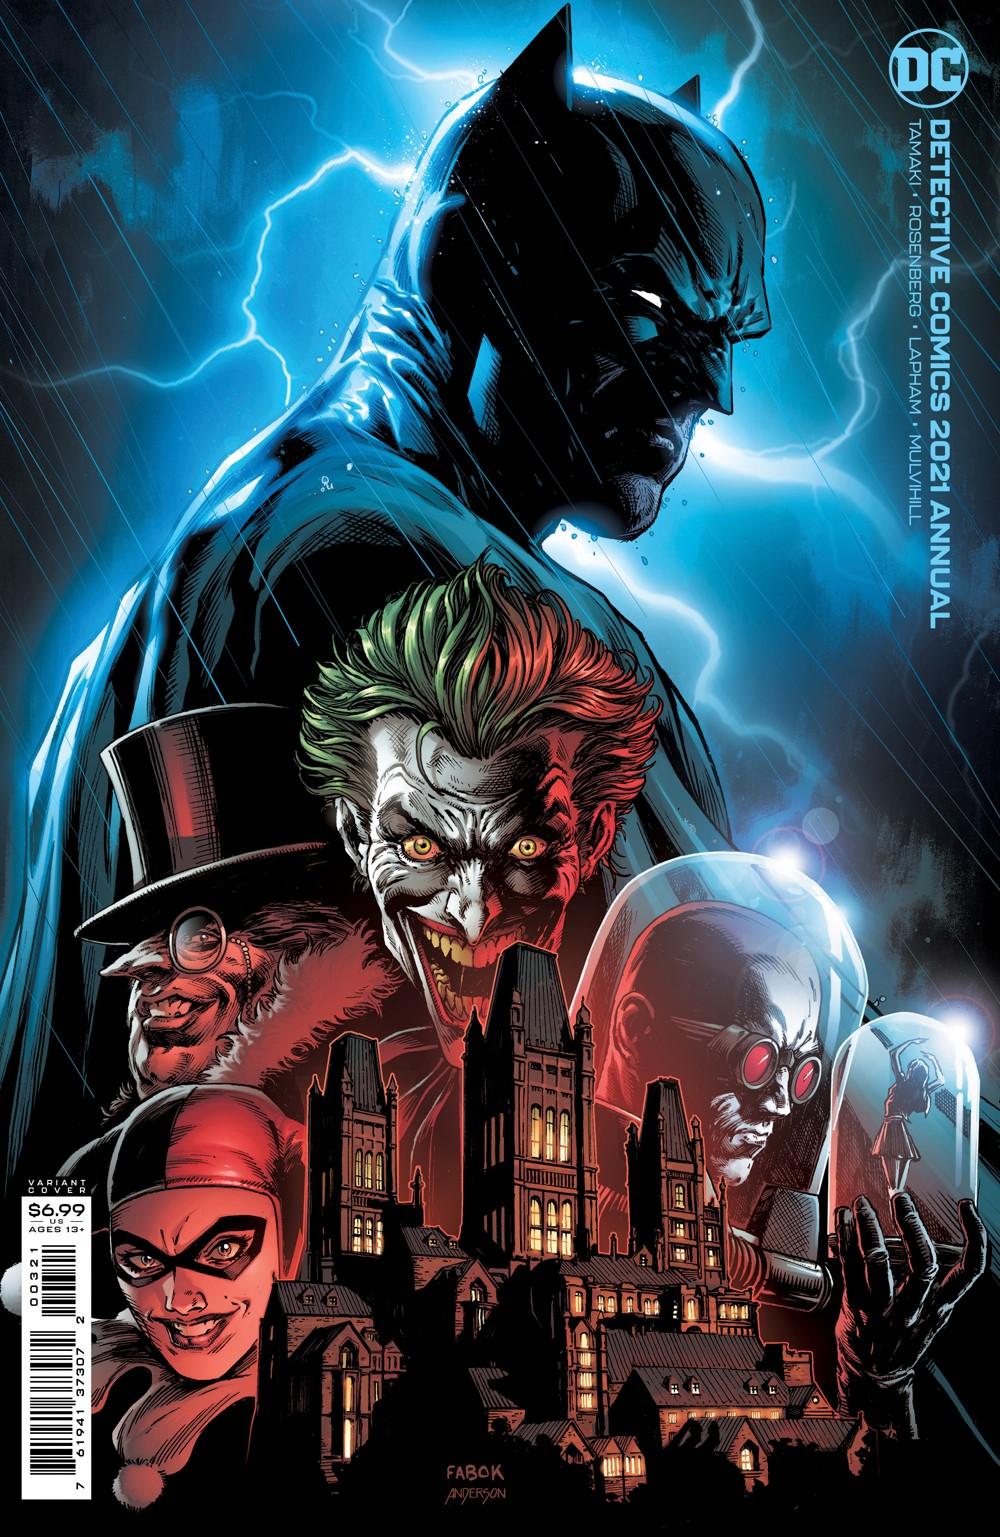 DTC_2021_ANNL_Cv1_var_00121 DC Comics November 2021 Solicitations